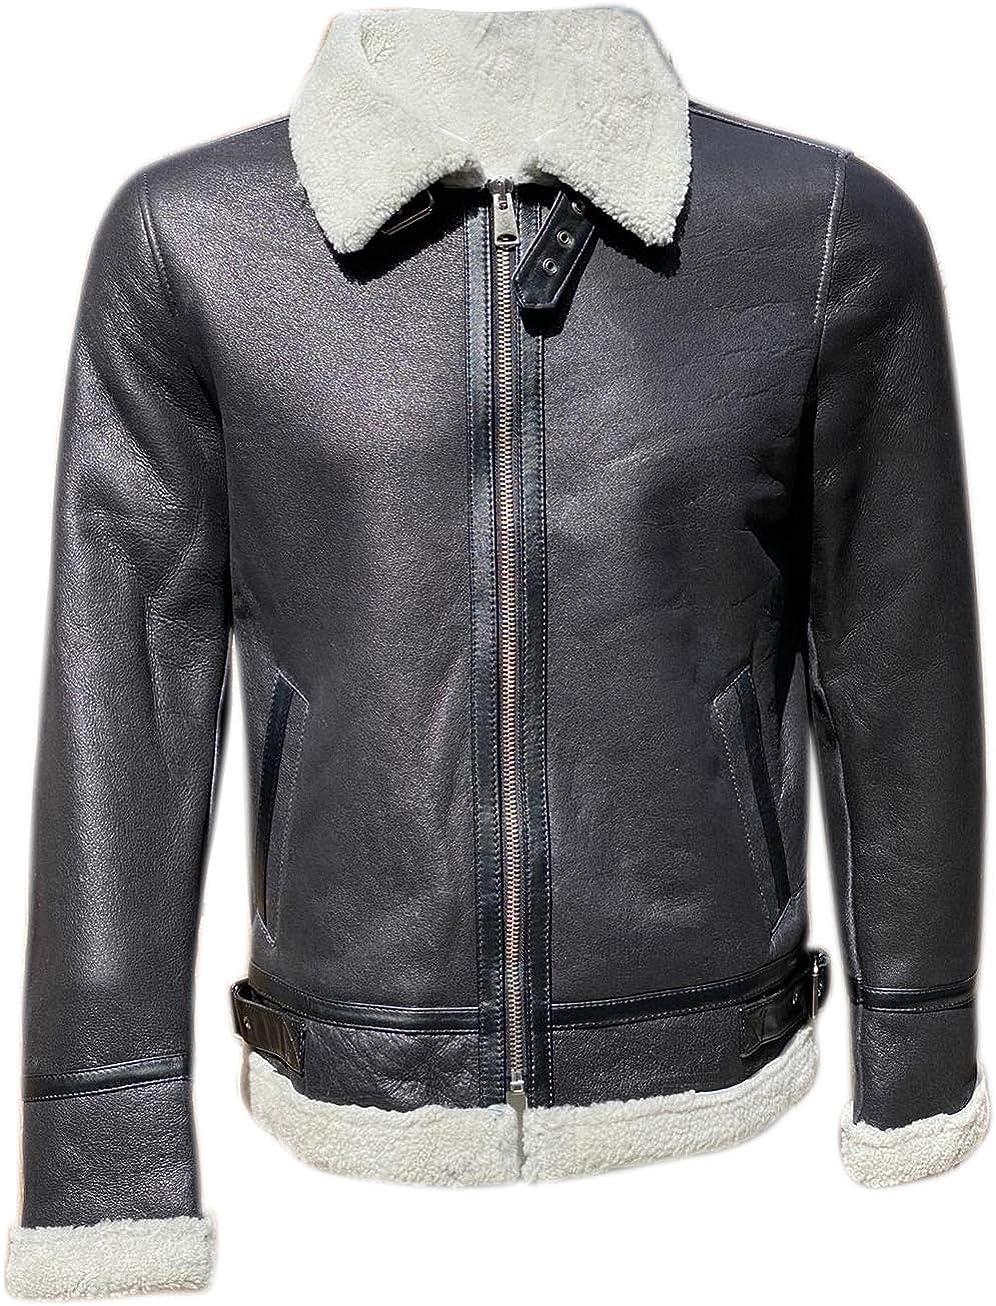 Quality wears usa Mens Sheepskin Shearling Leather Bomber Jacket Regular & Special Sizes (Black-White Fur)